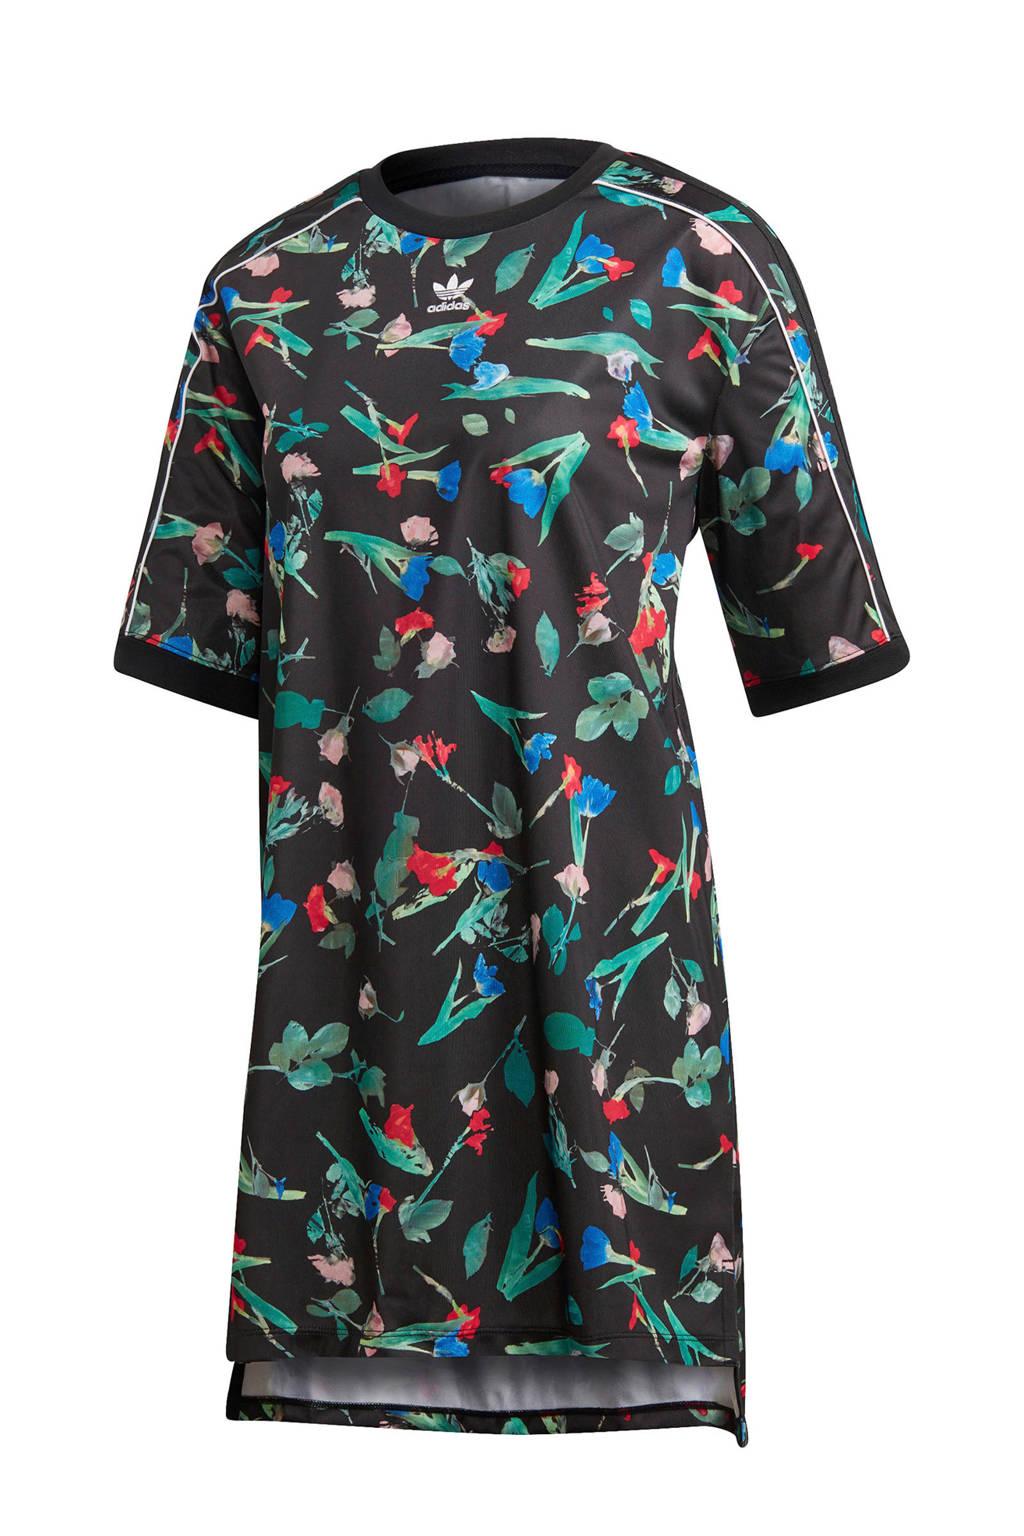 adidas originals jurk, Zwart/bloemen